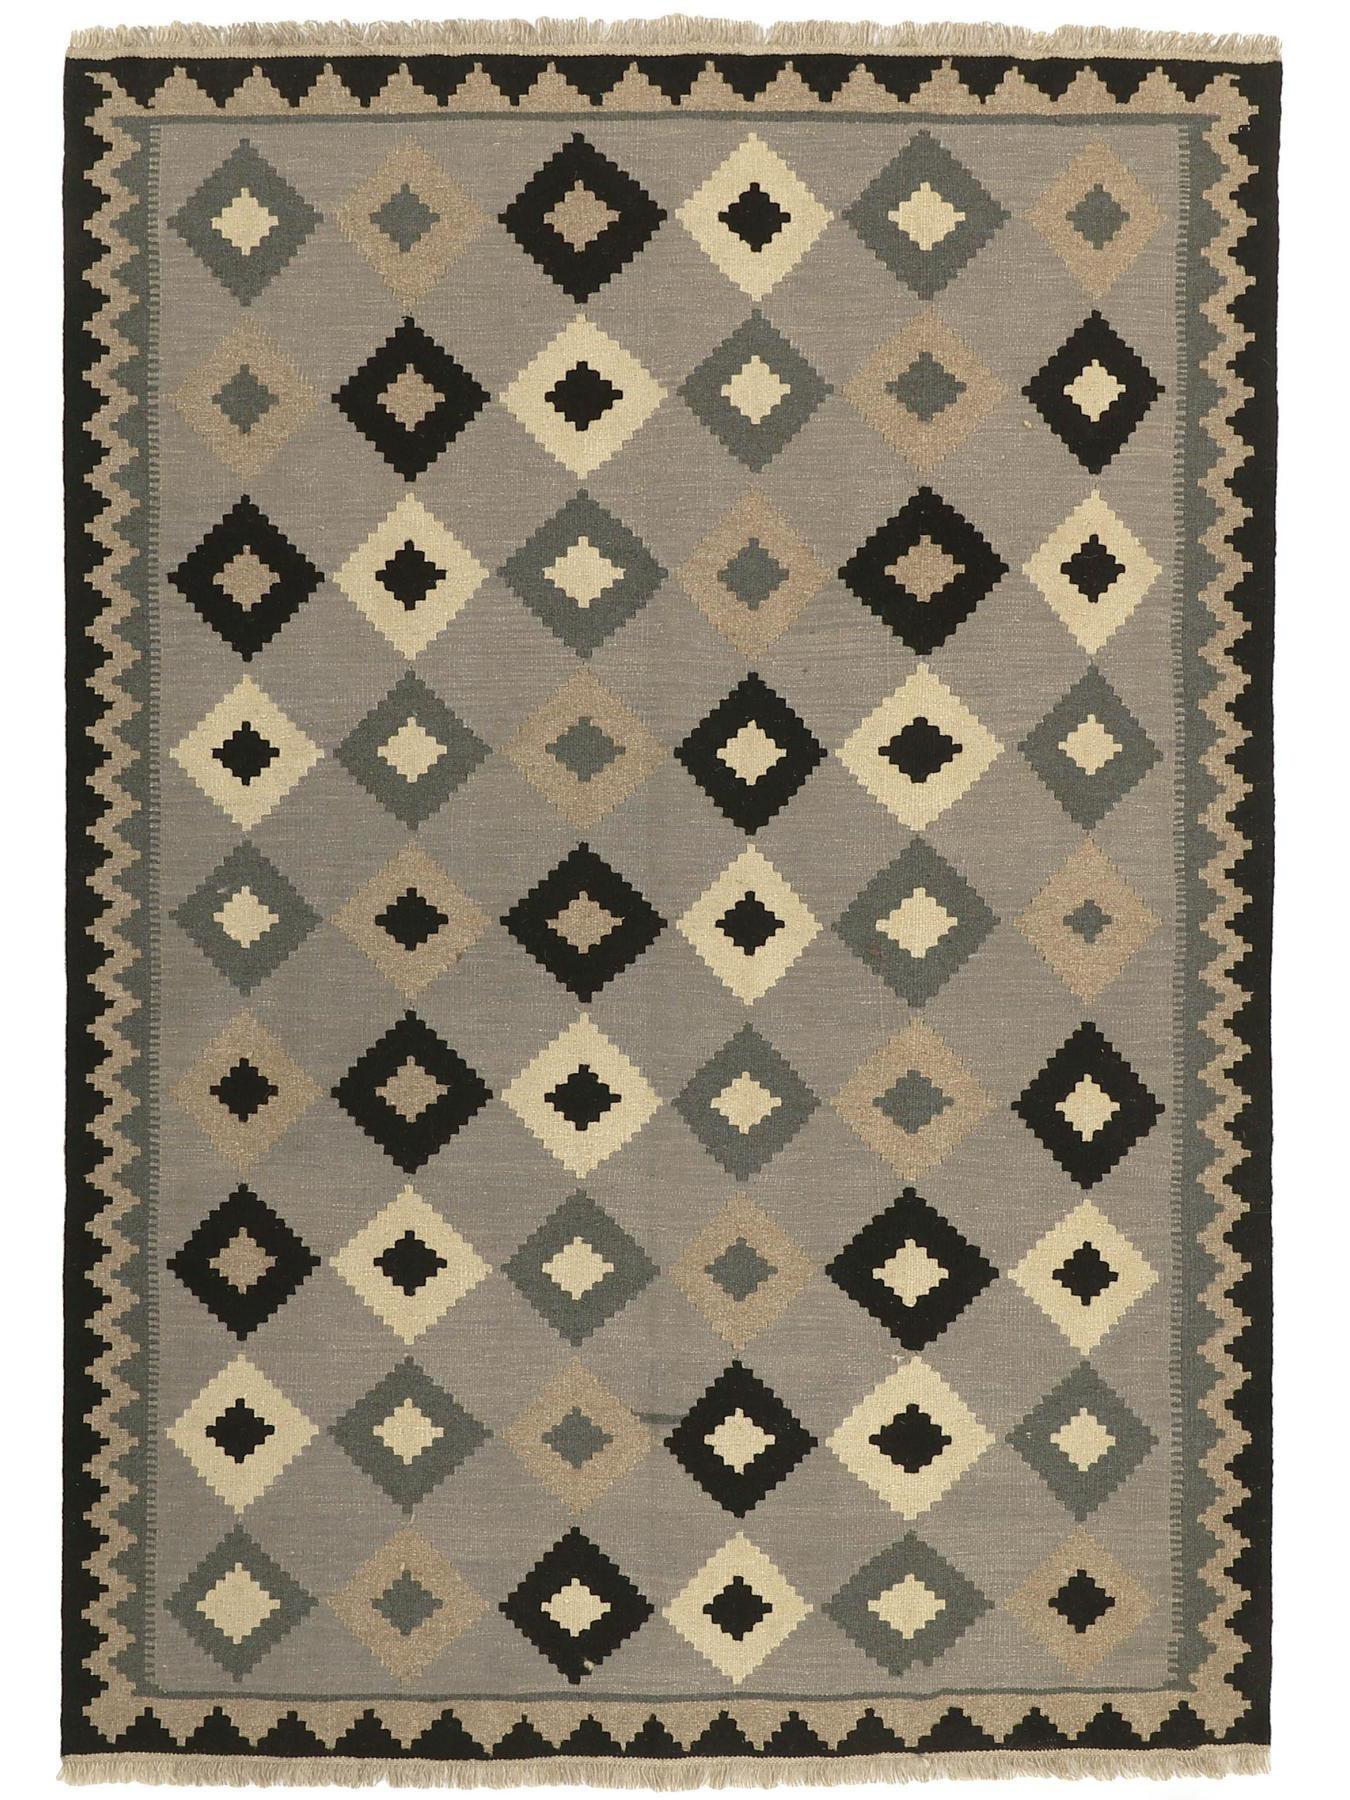 Kilims traditionnels - Kilim